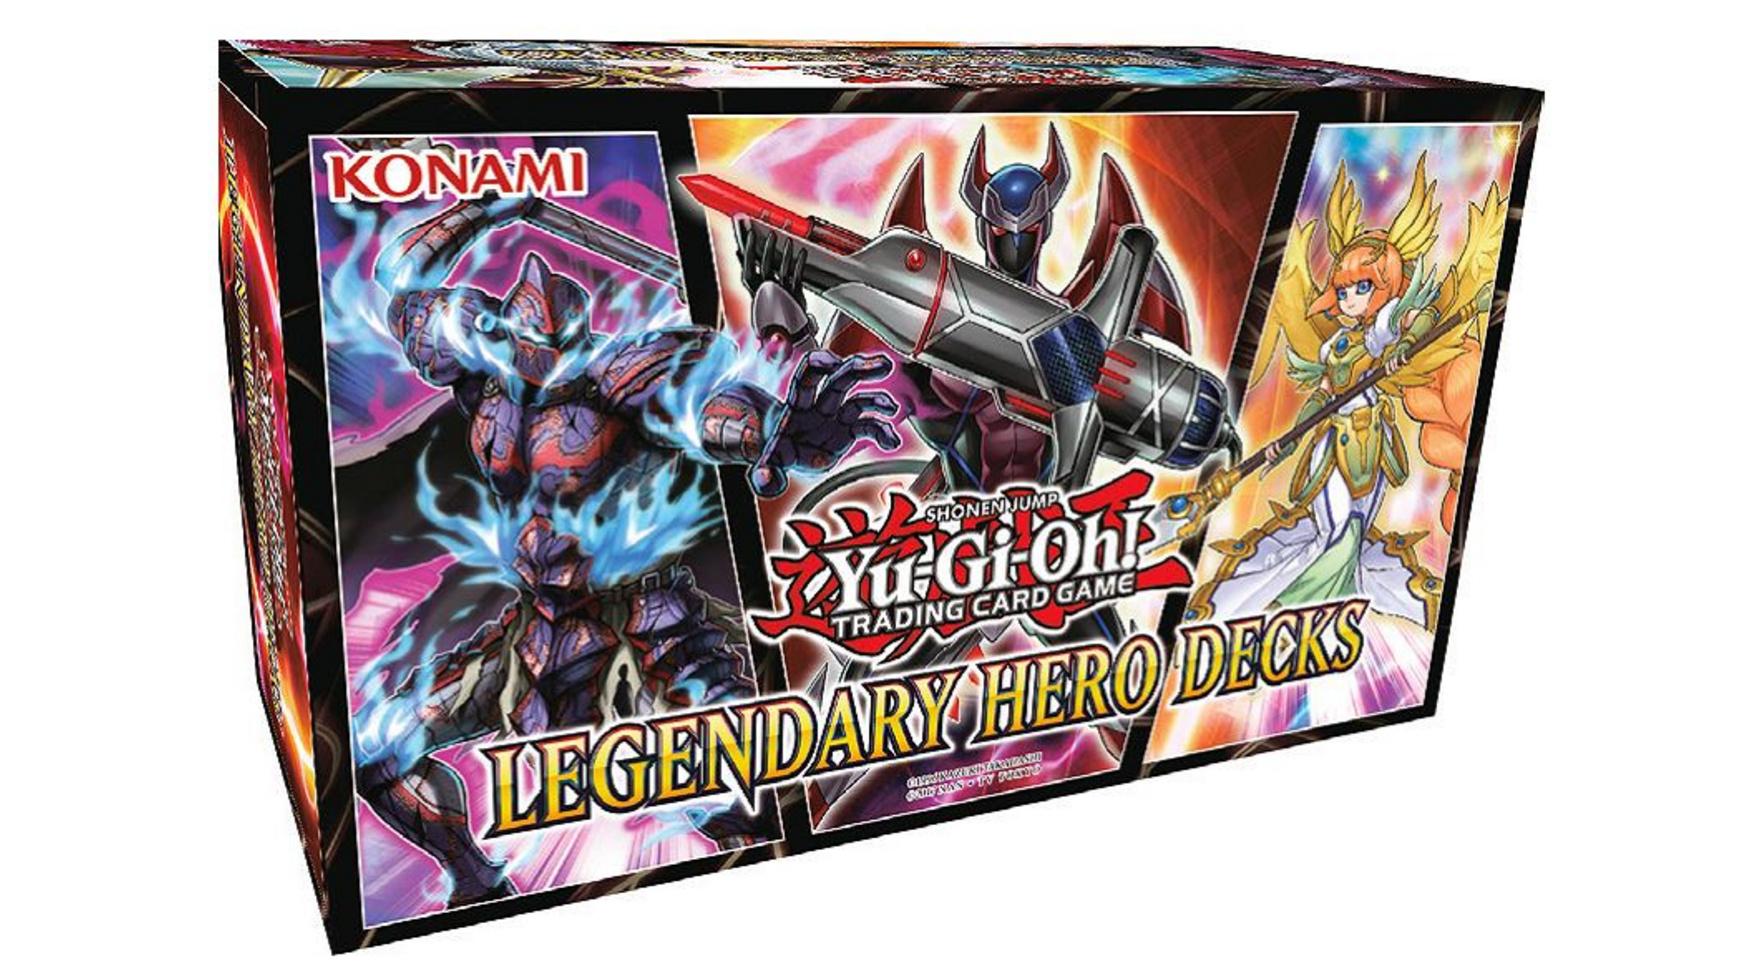 Yu-Gi-Oh Sammelkartenspiel - Yu-Gi-Oh! Legendary Hero Decks